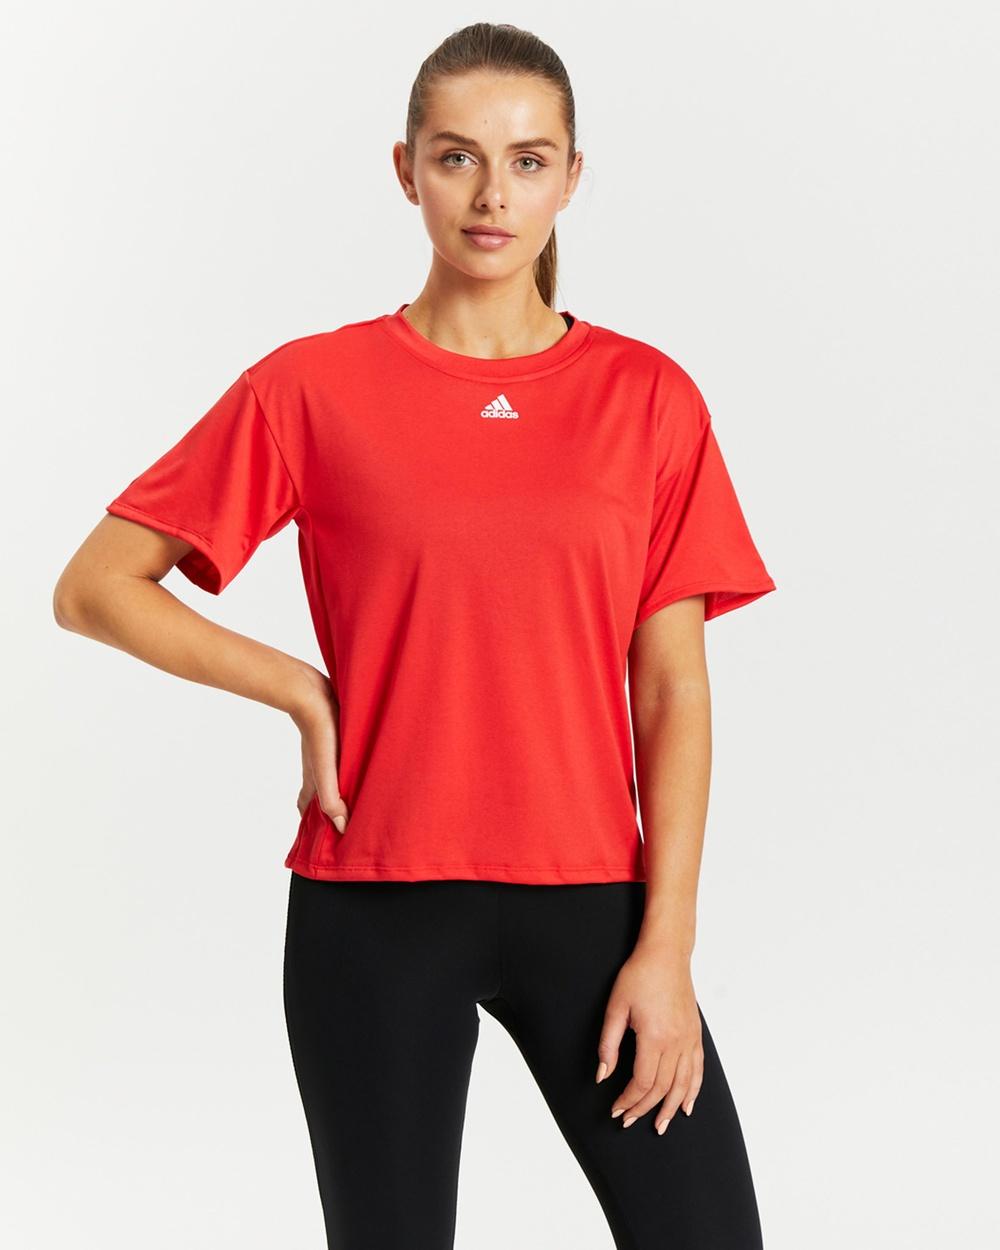 adidas Performance Training 3 Stripes AEROREADY Tee Short Sleeve T-Shirts Vivid Red 3-Stripes Australia